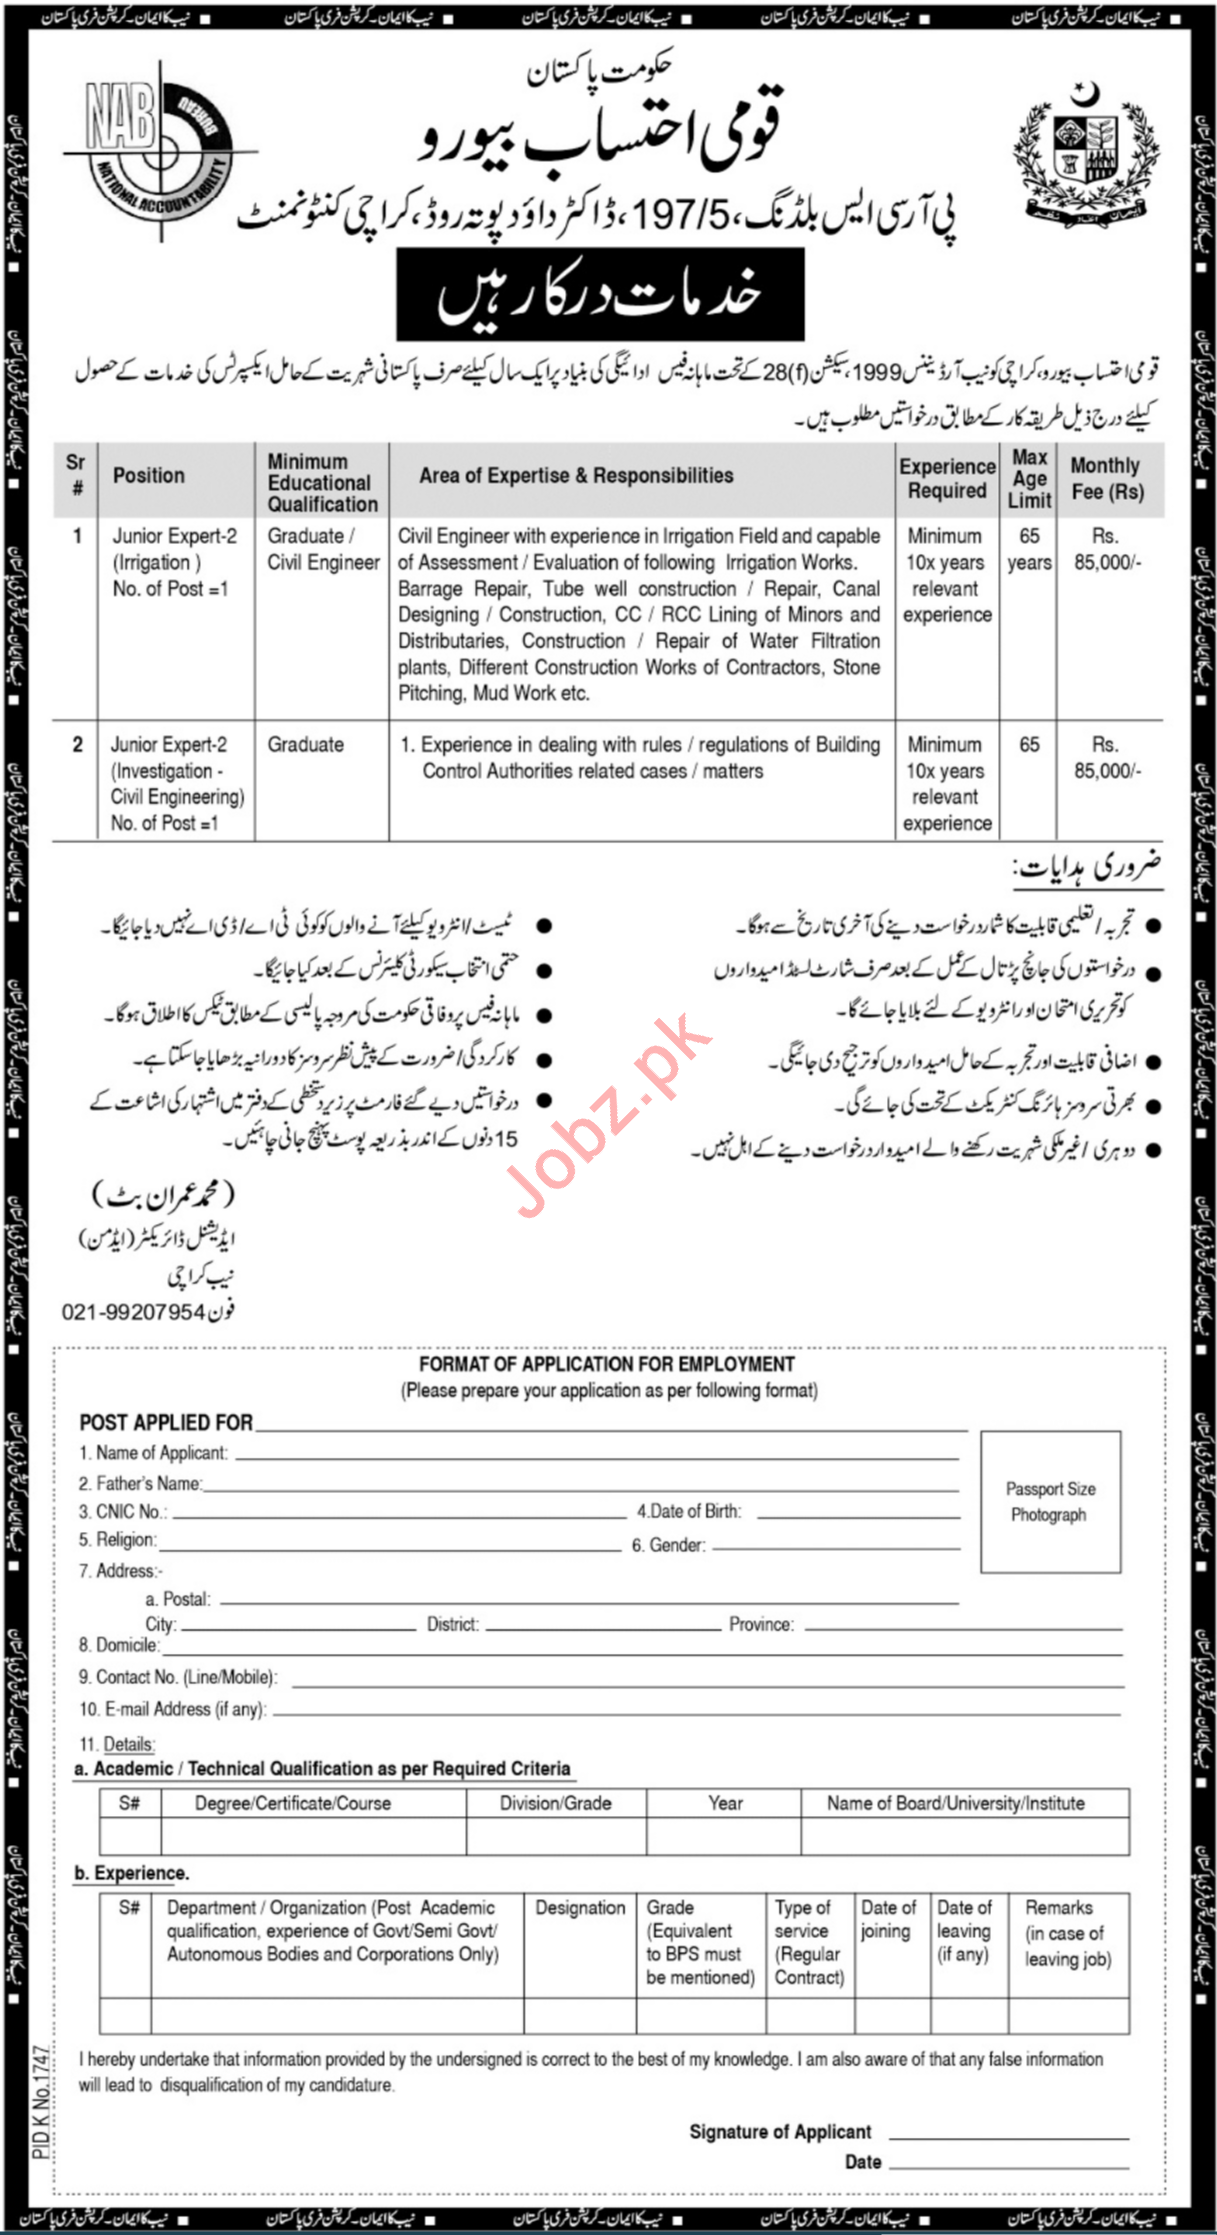 National Accountability Bureau NAB Jobs in Karachi Cantt